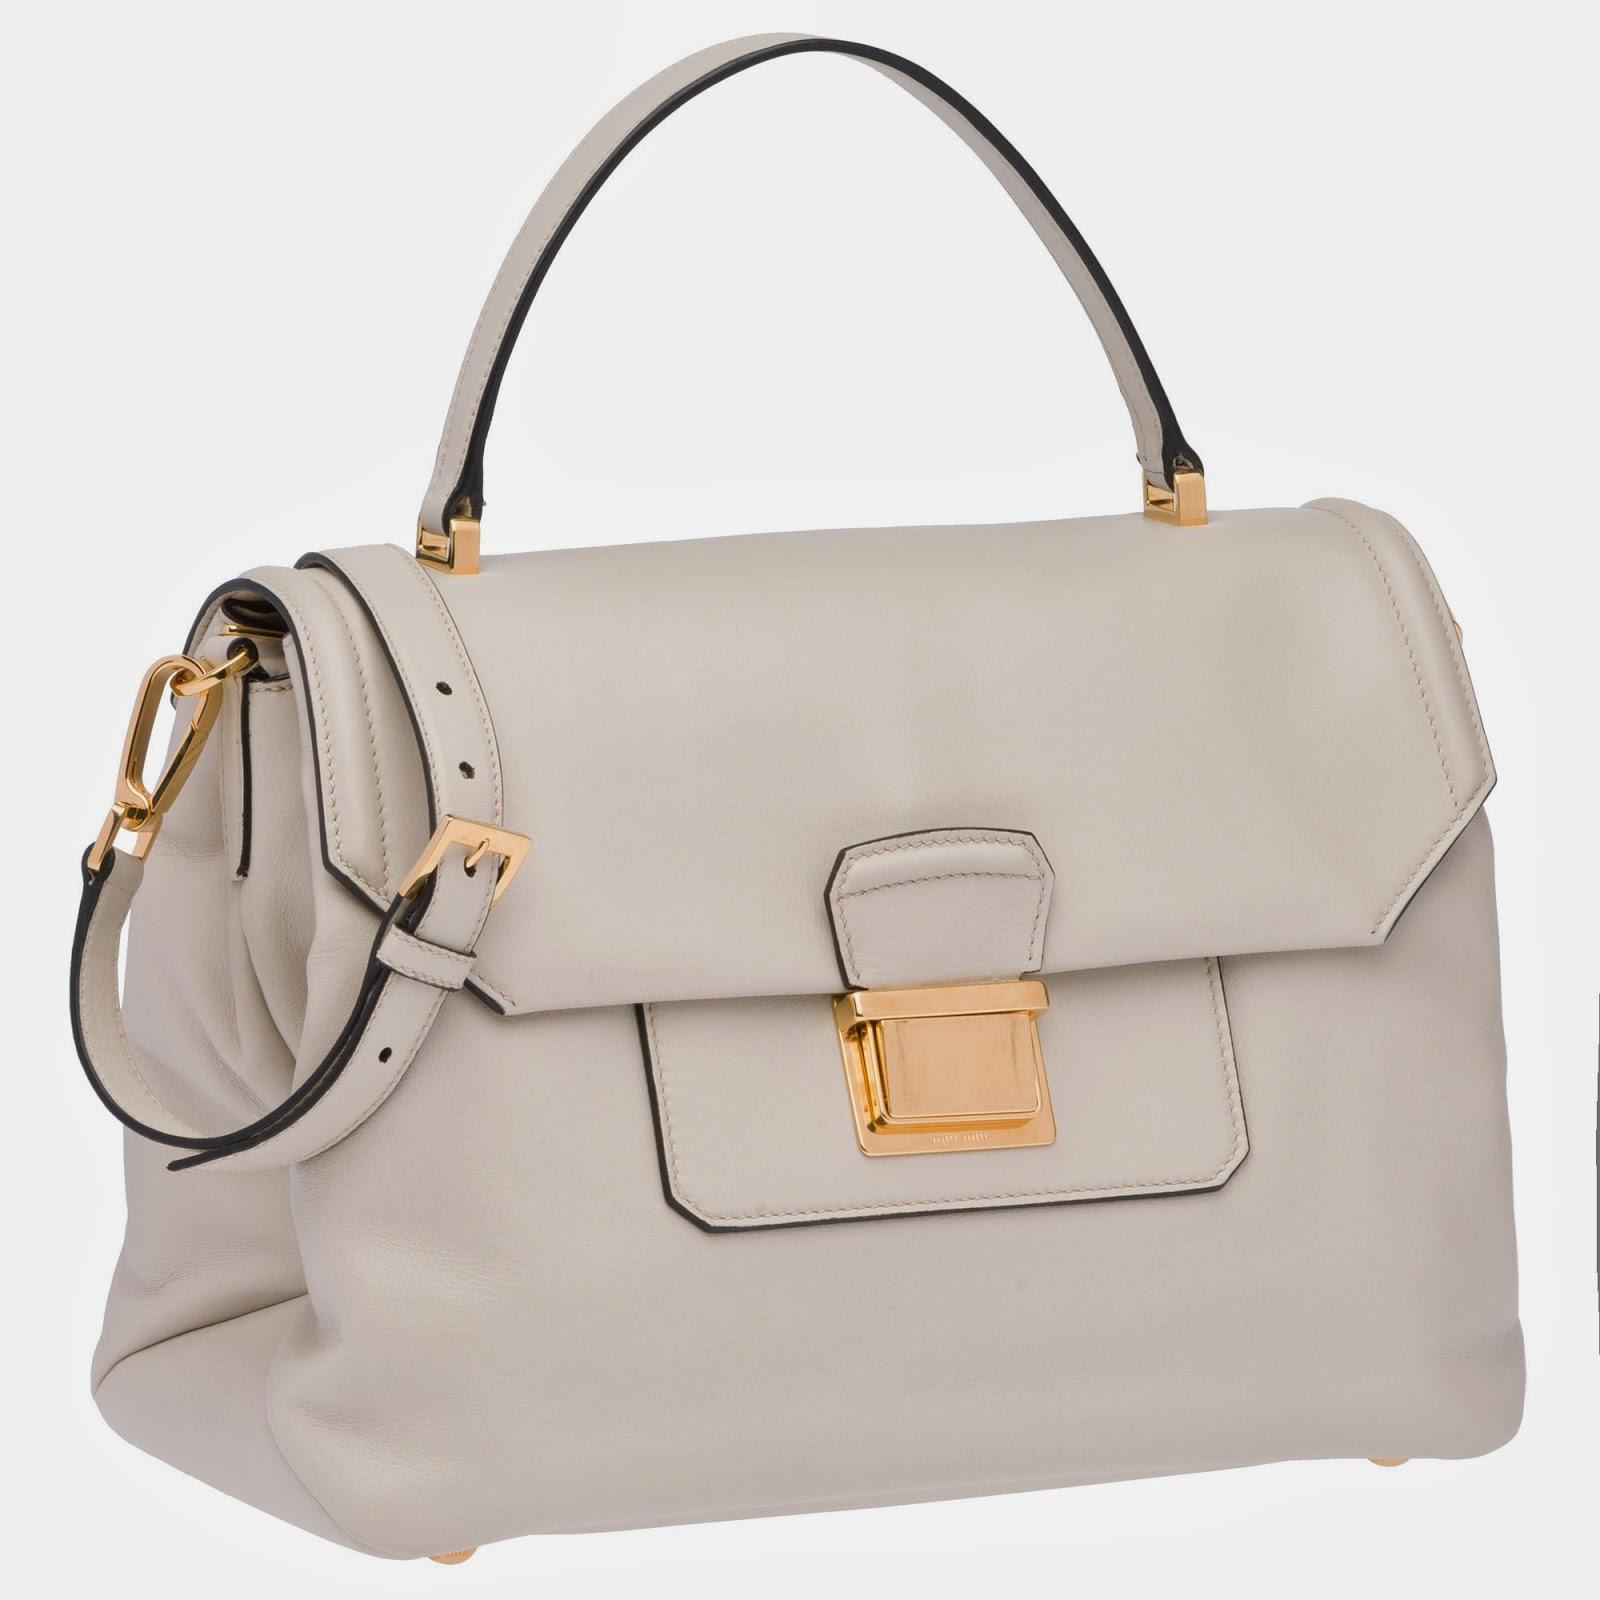 omuz+%25C3%25A7antas%25C4%25B1+modelleri Miu Miu Herbst Winter 2014 Handtaschen Modelle